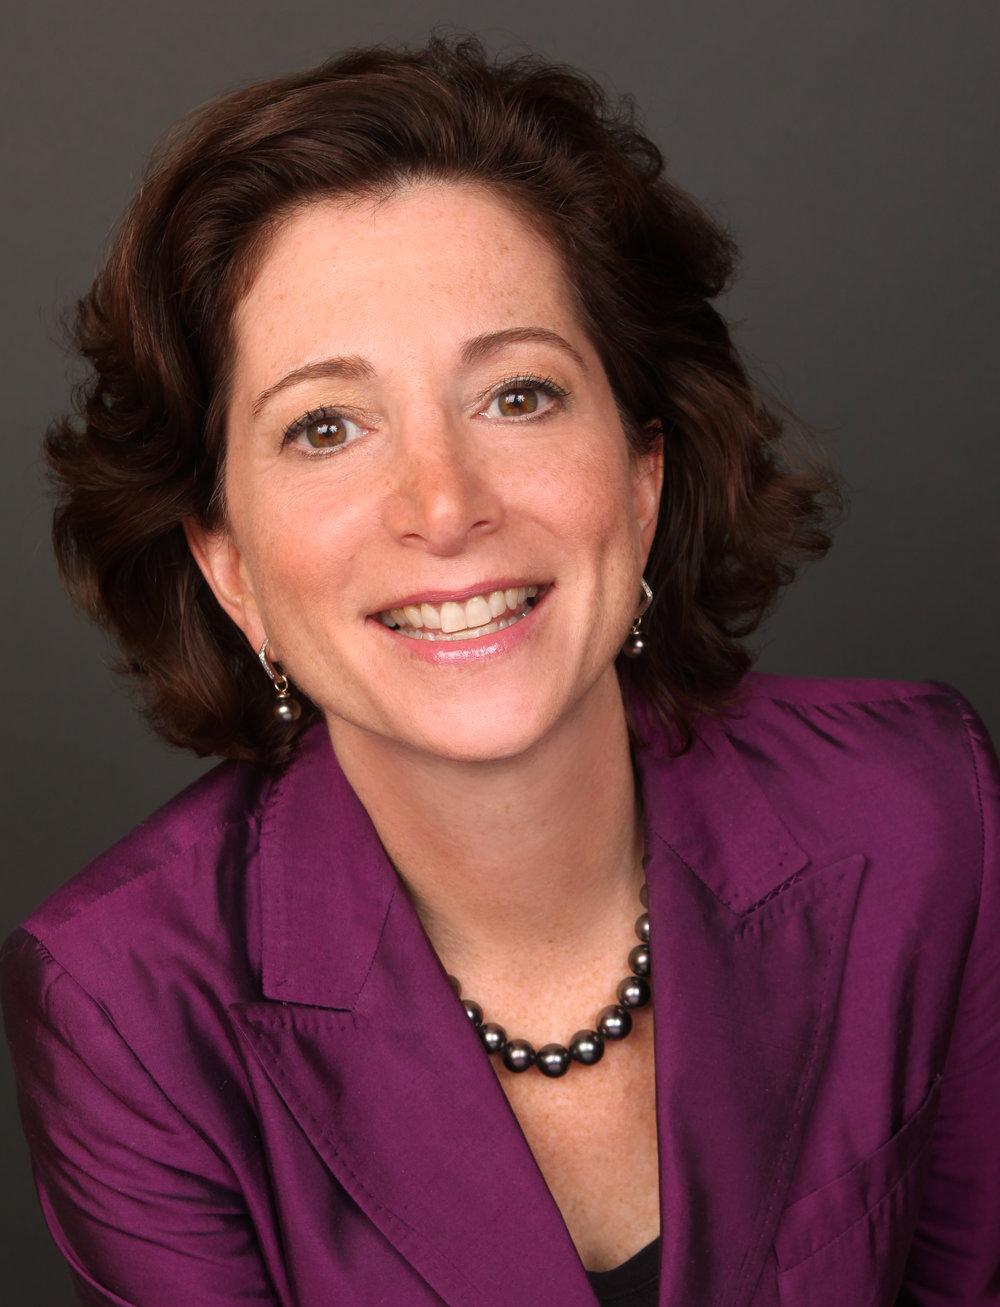 Pamela Passman <br> President & CEO | CREATe Compliance